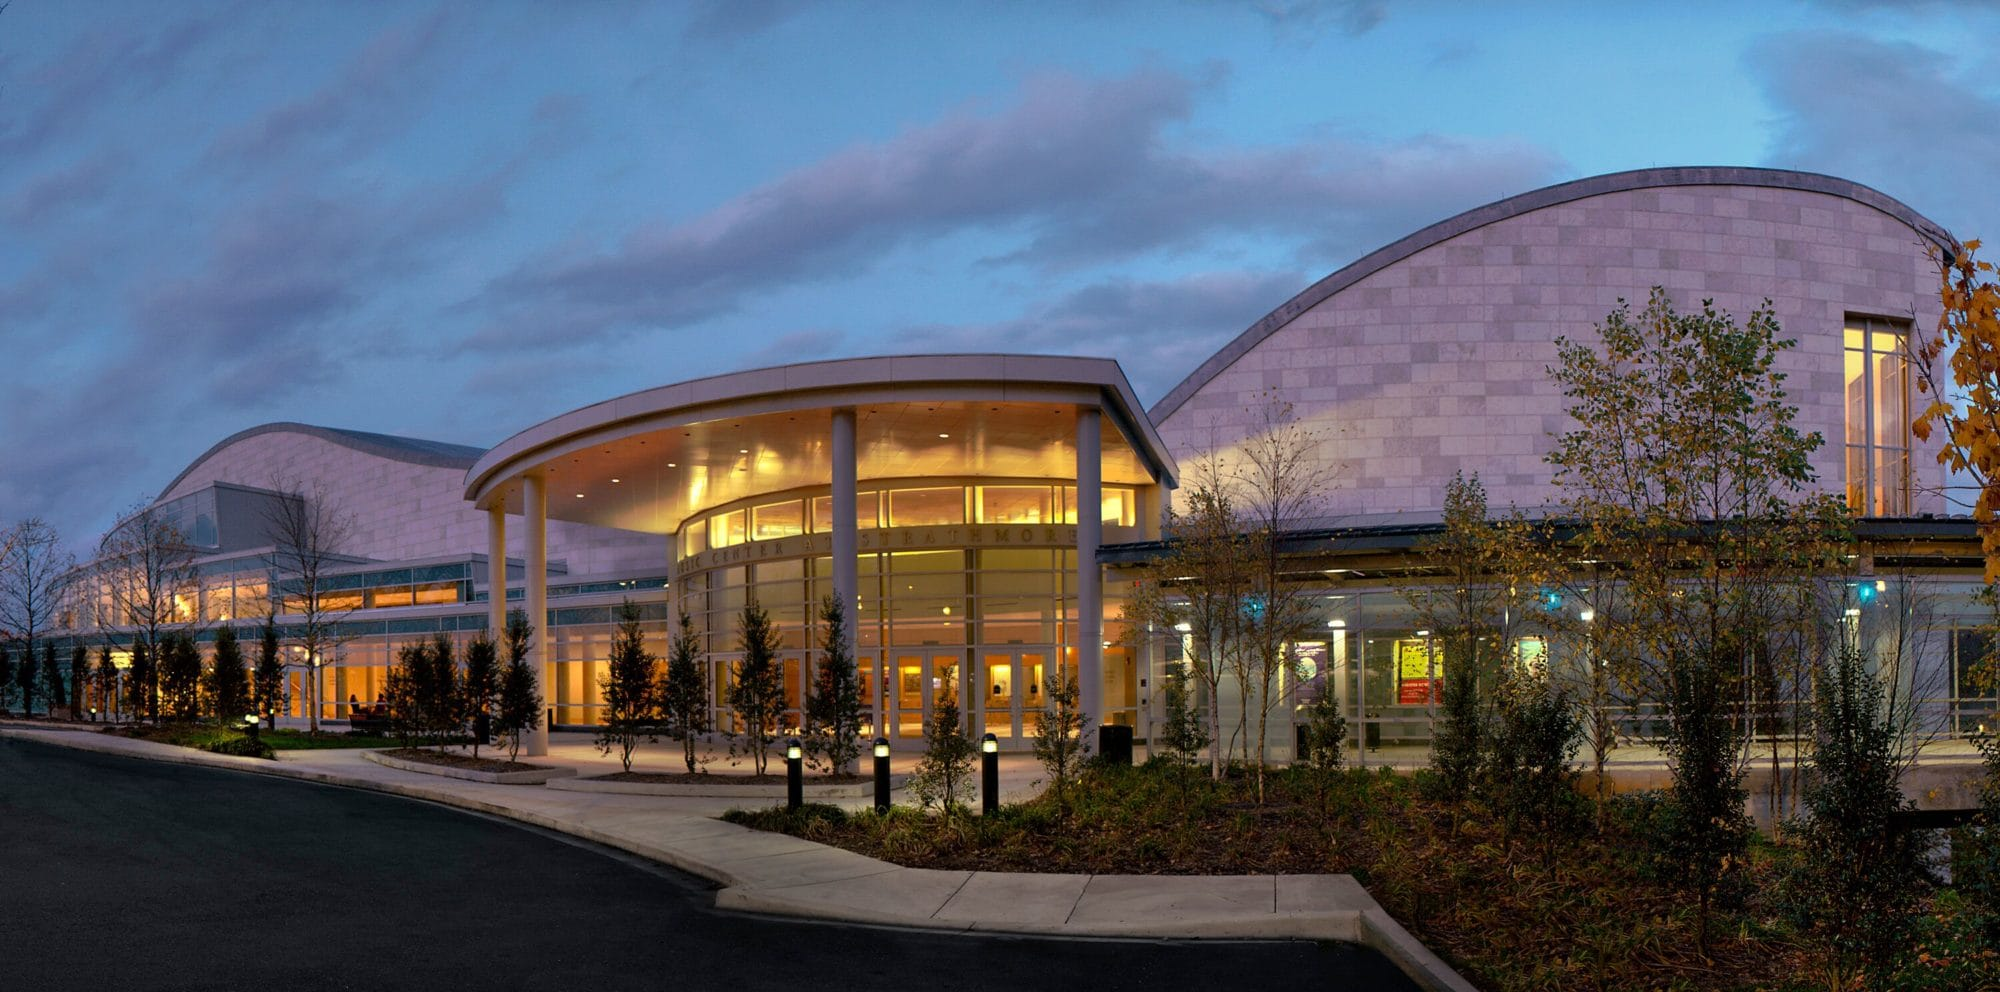 Strathmore Music Center. Photo by Jim Morris.